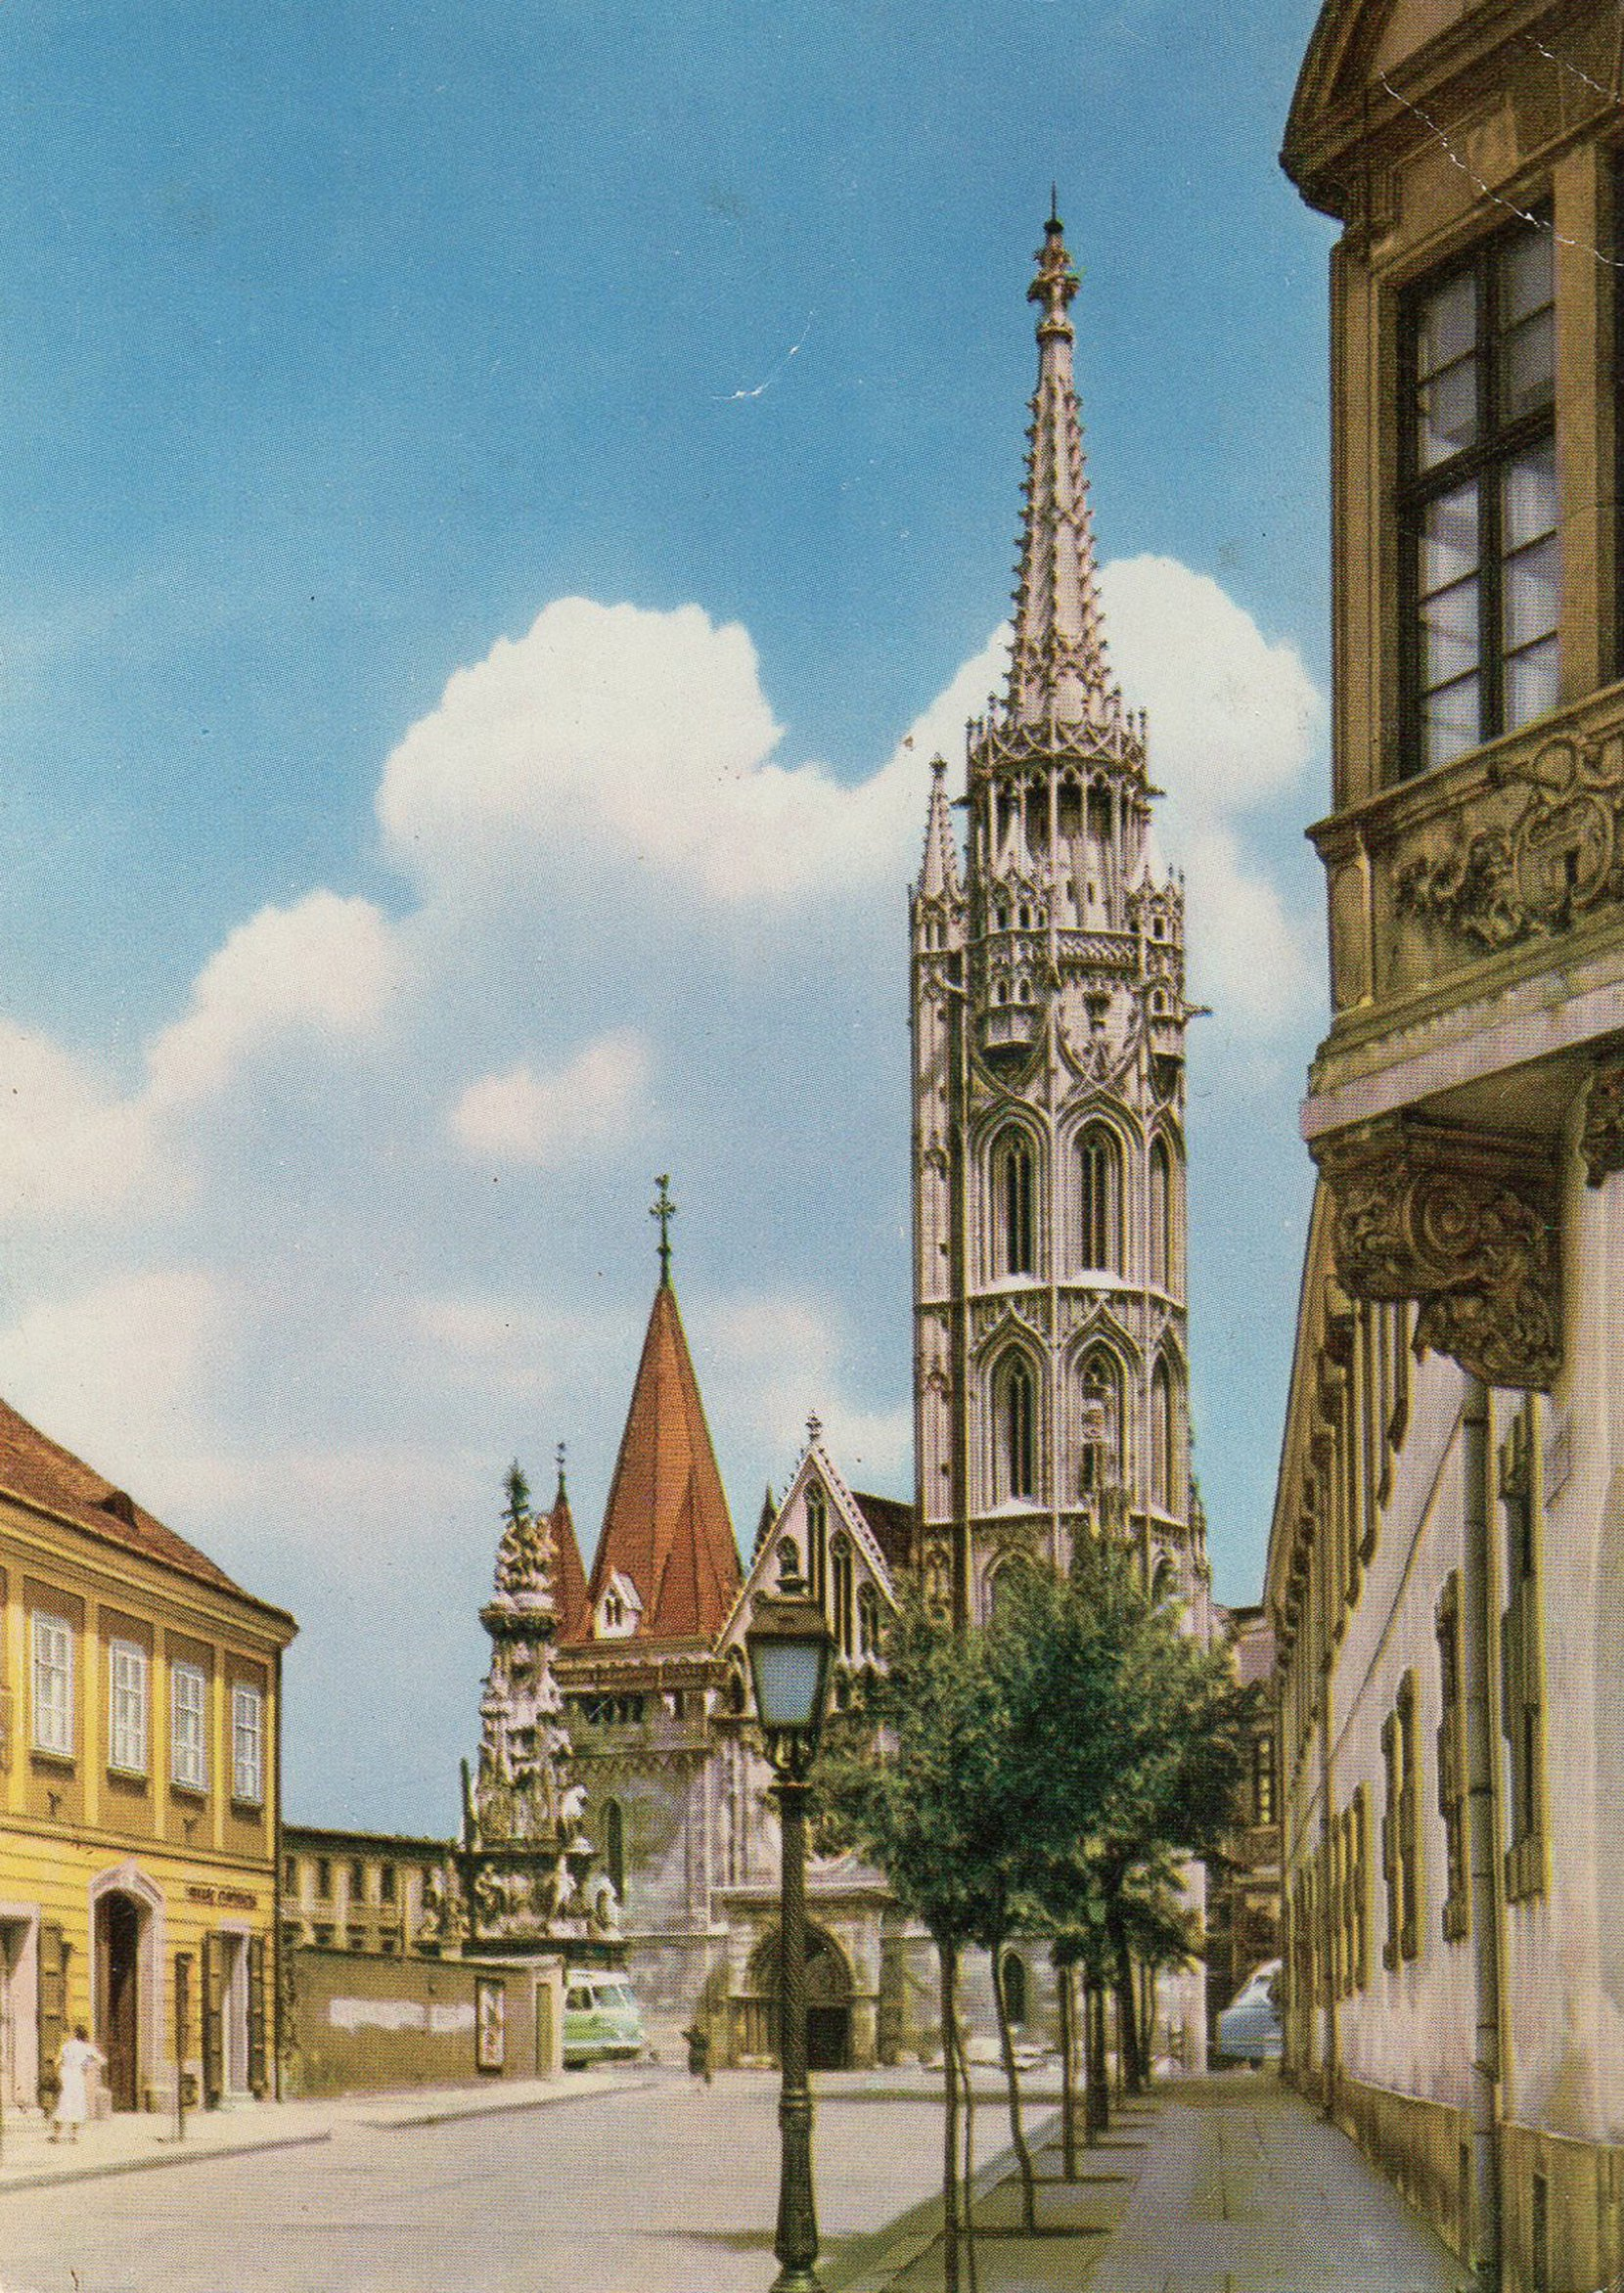 budapest (hungary) postcards standard – printed card